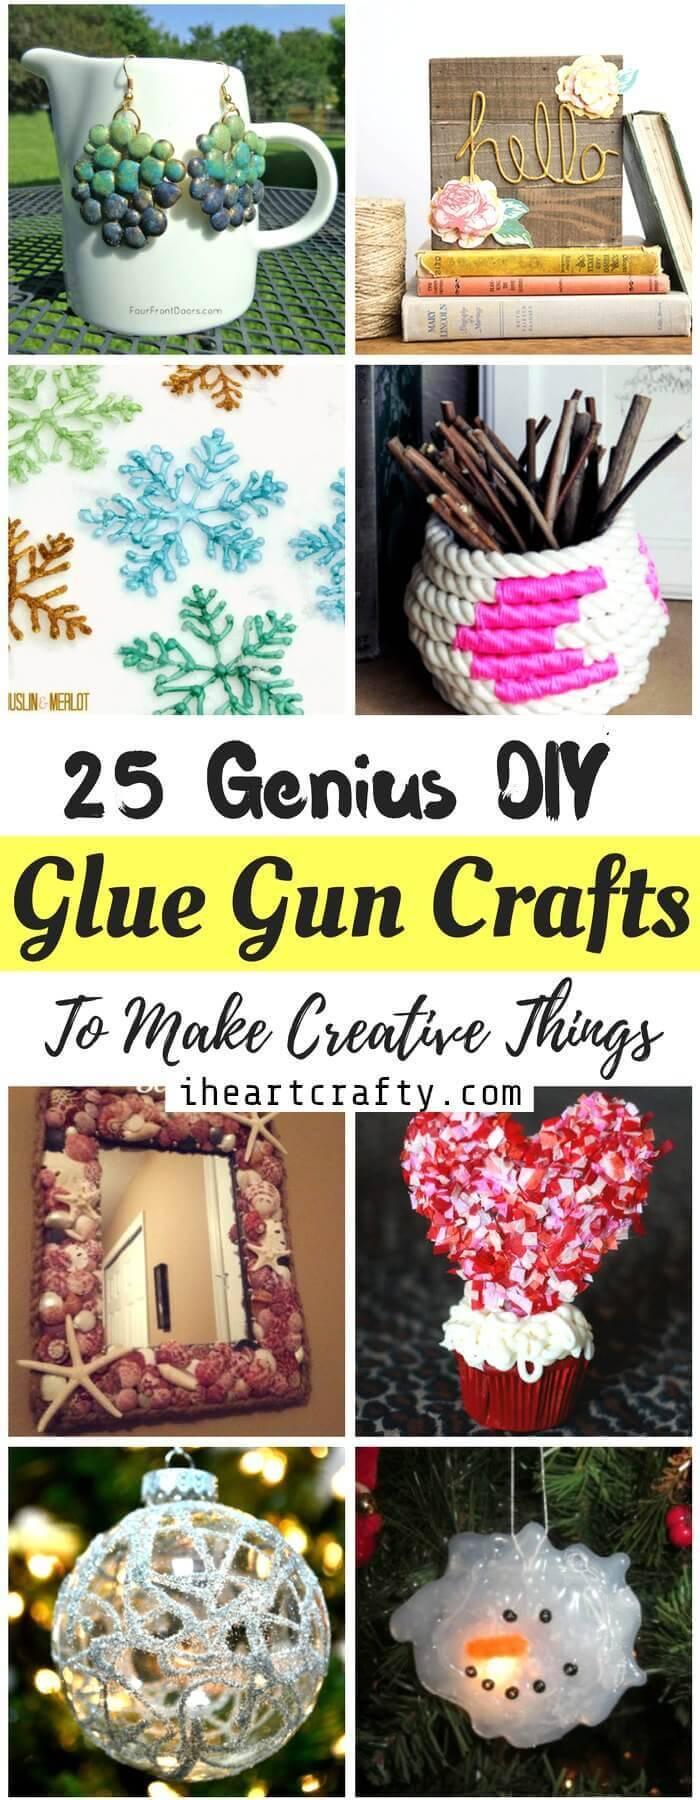 DIY Glue Gun Crafts